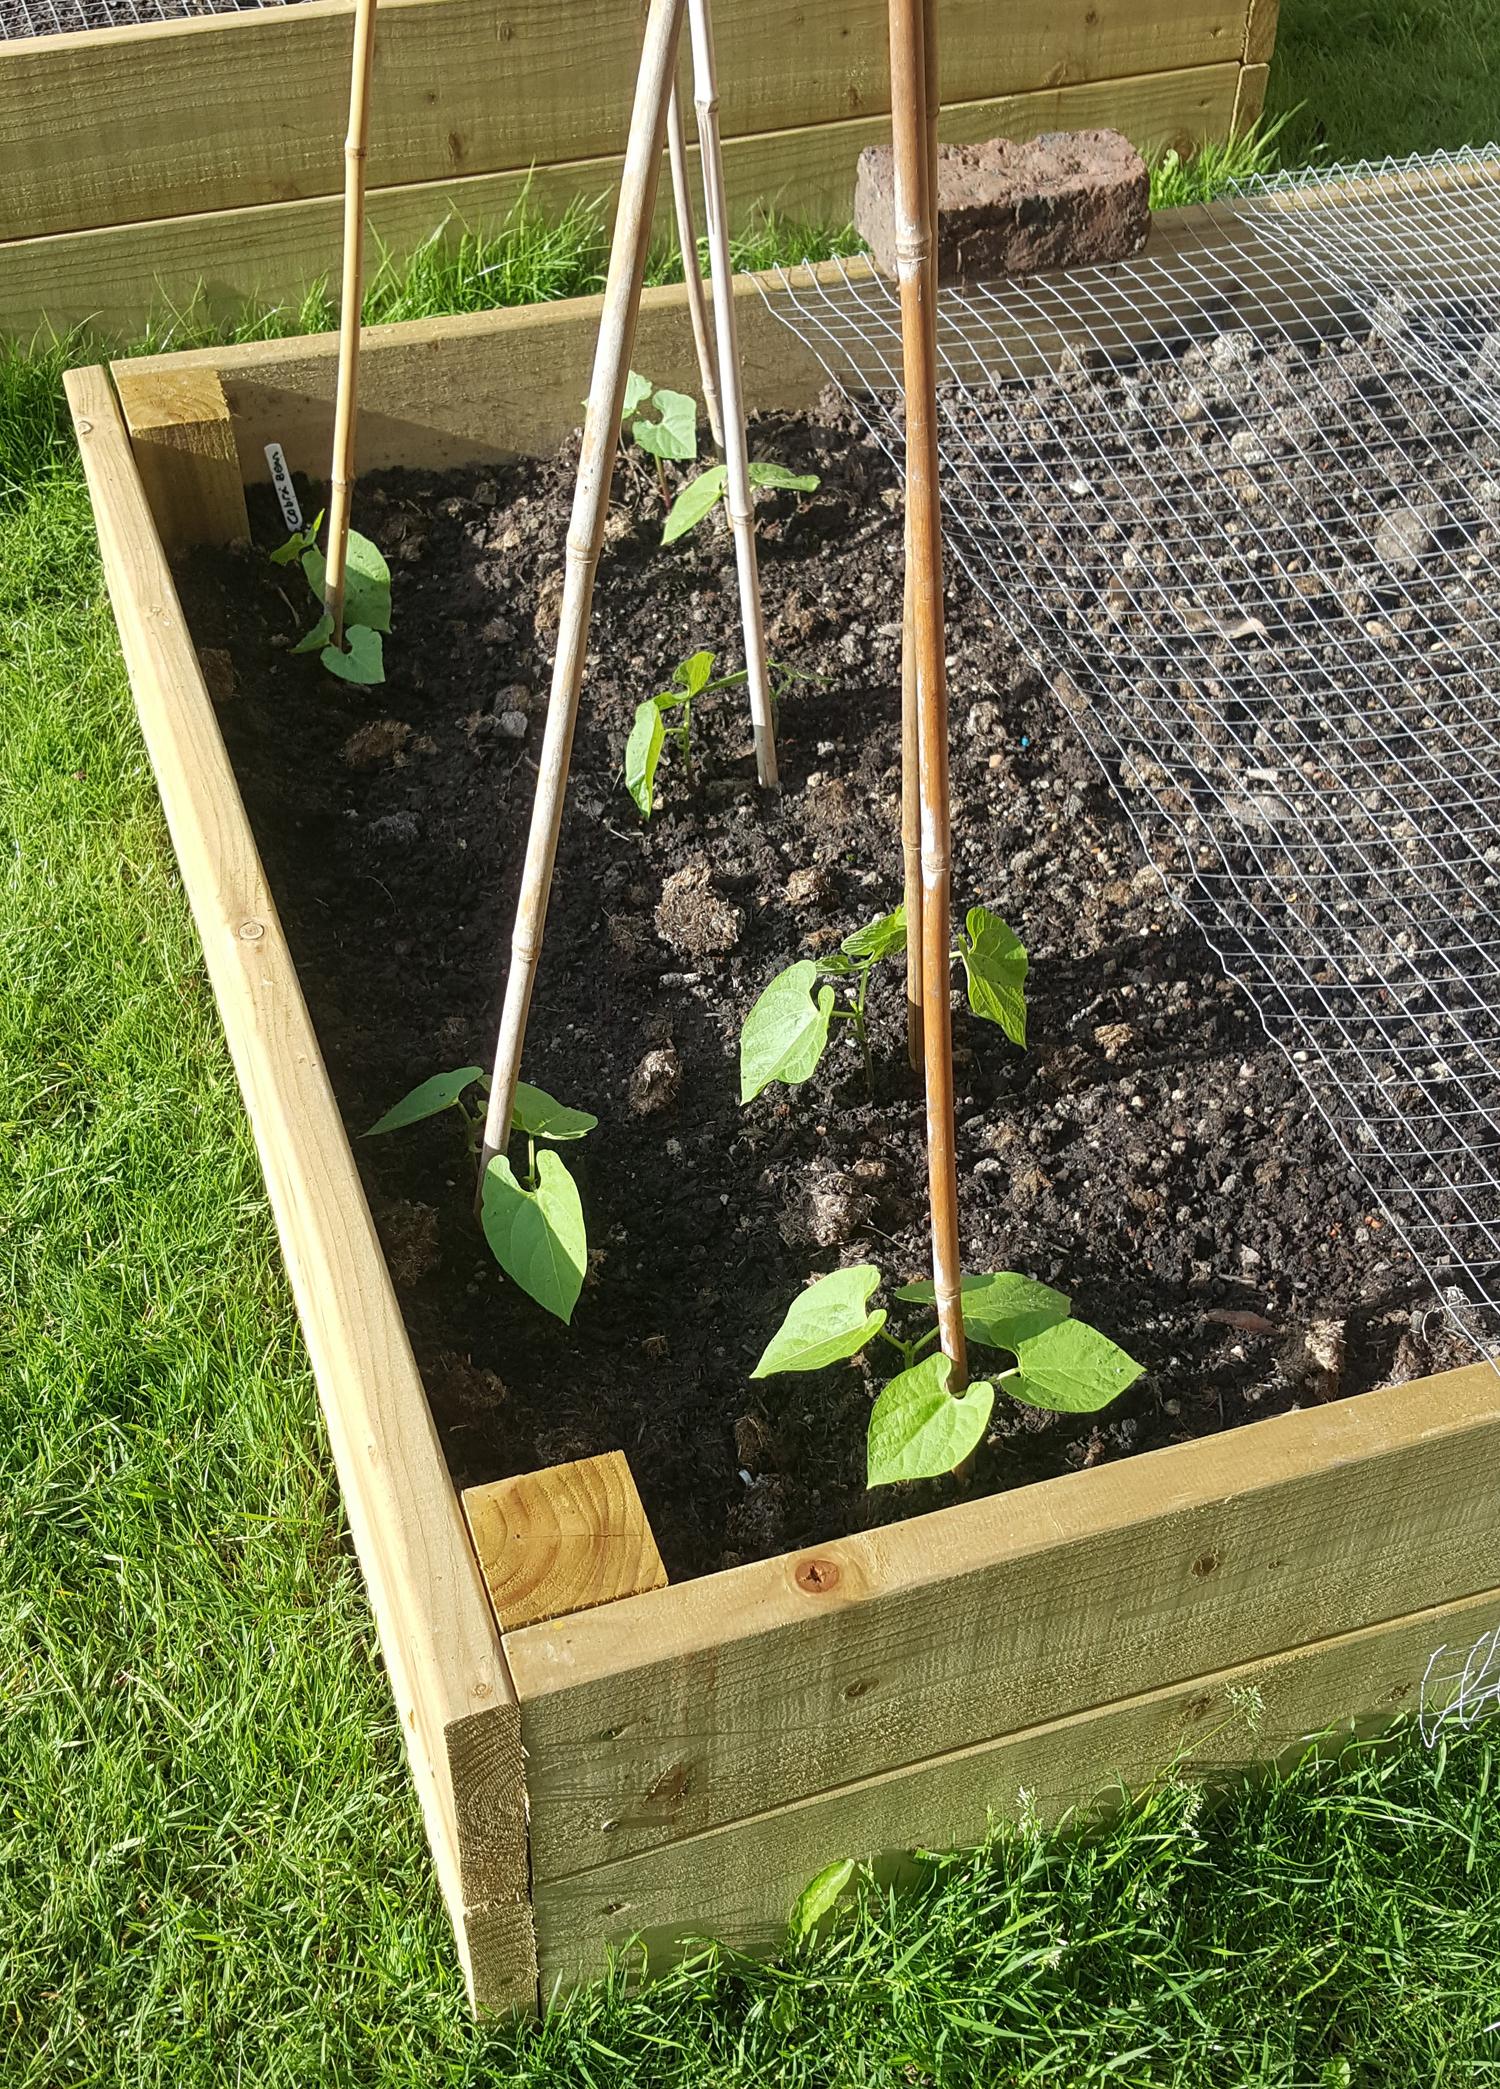 beans 1 - 4 june